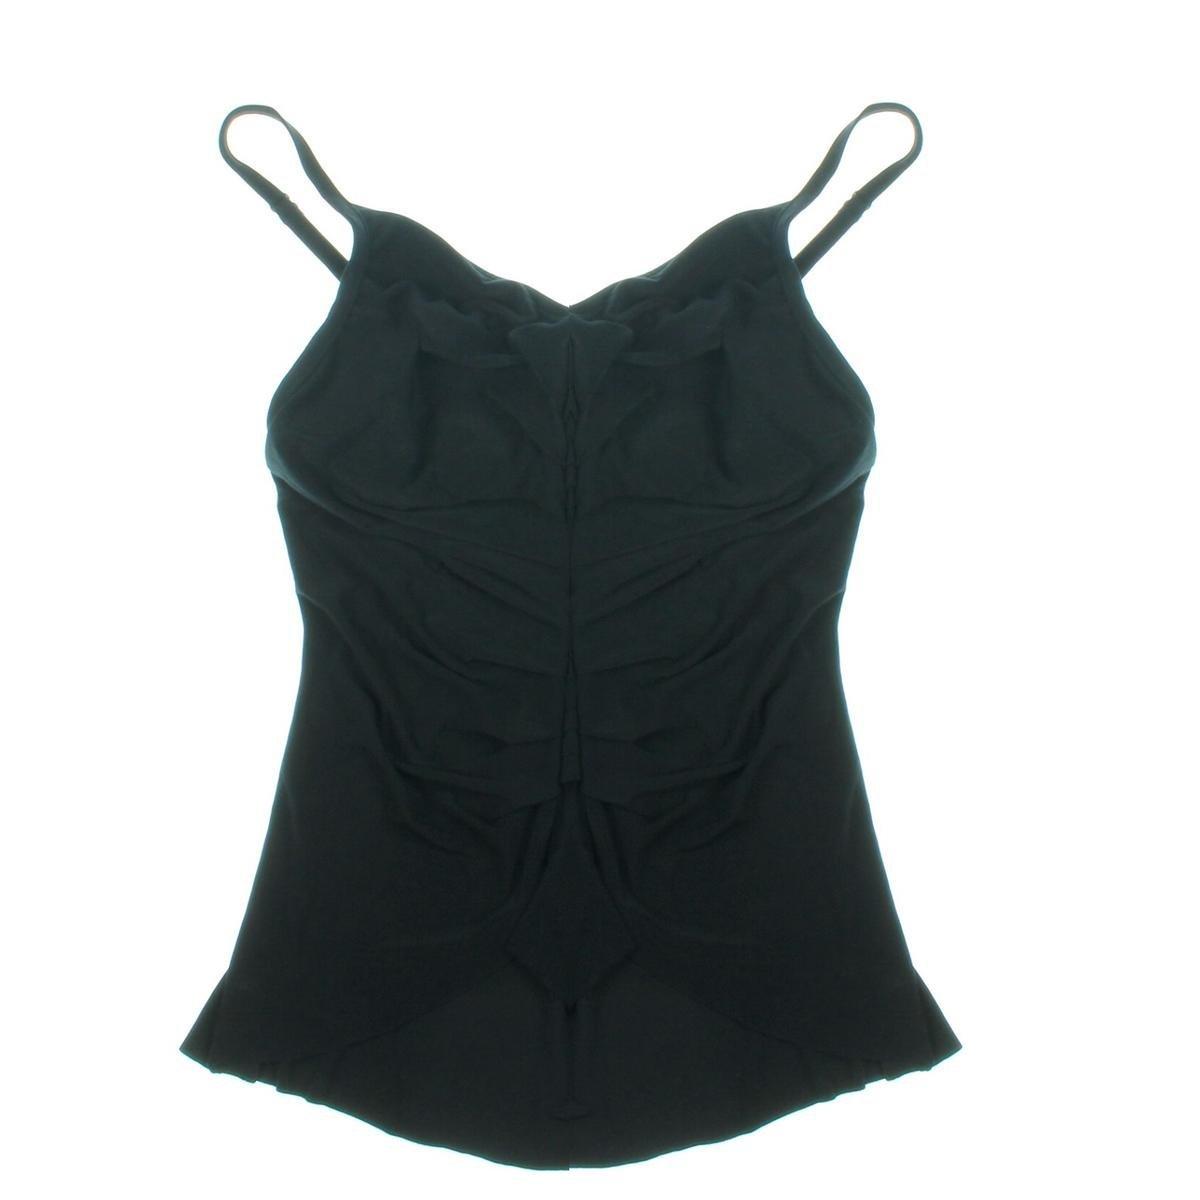 41b1171194e4e Magicsuit Women's Solid Elle Tankini Top Black Swimsuit Top 16 at Amazon  Women's Clothing store: